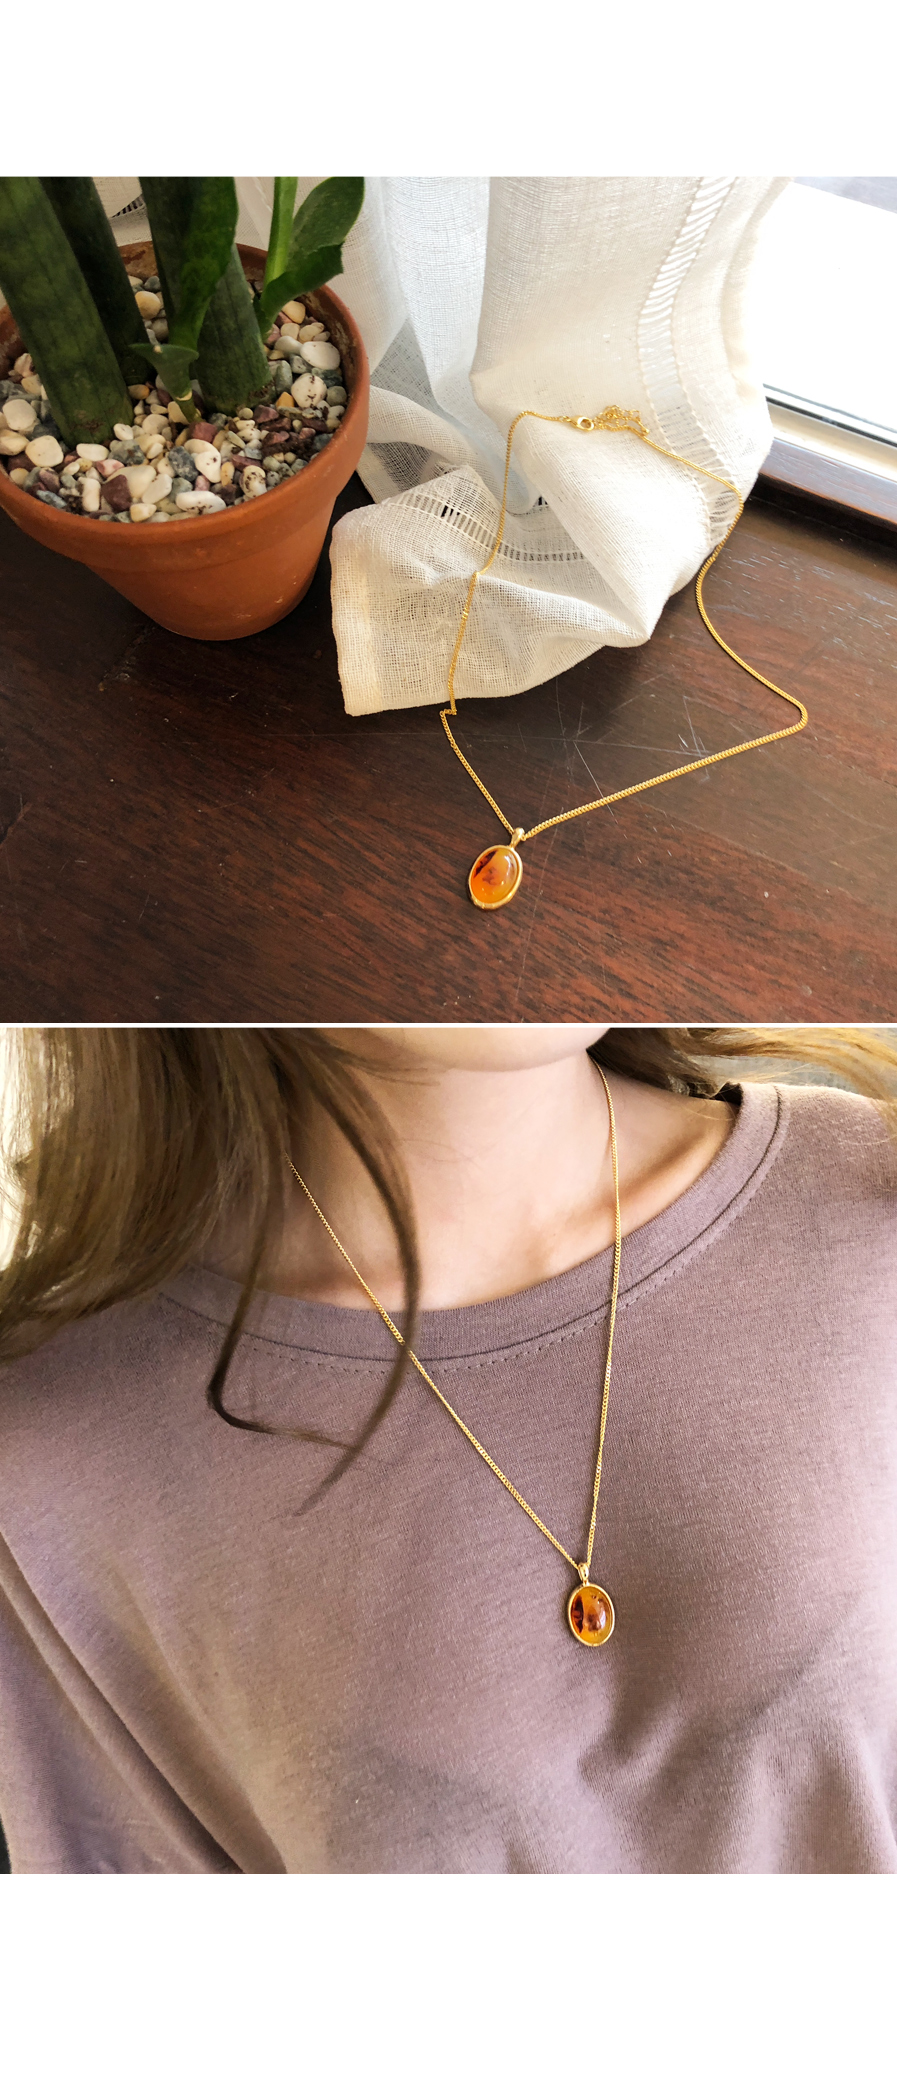 Sense Beads Necklace